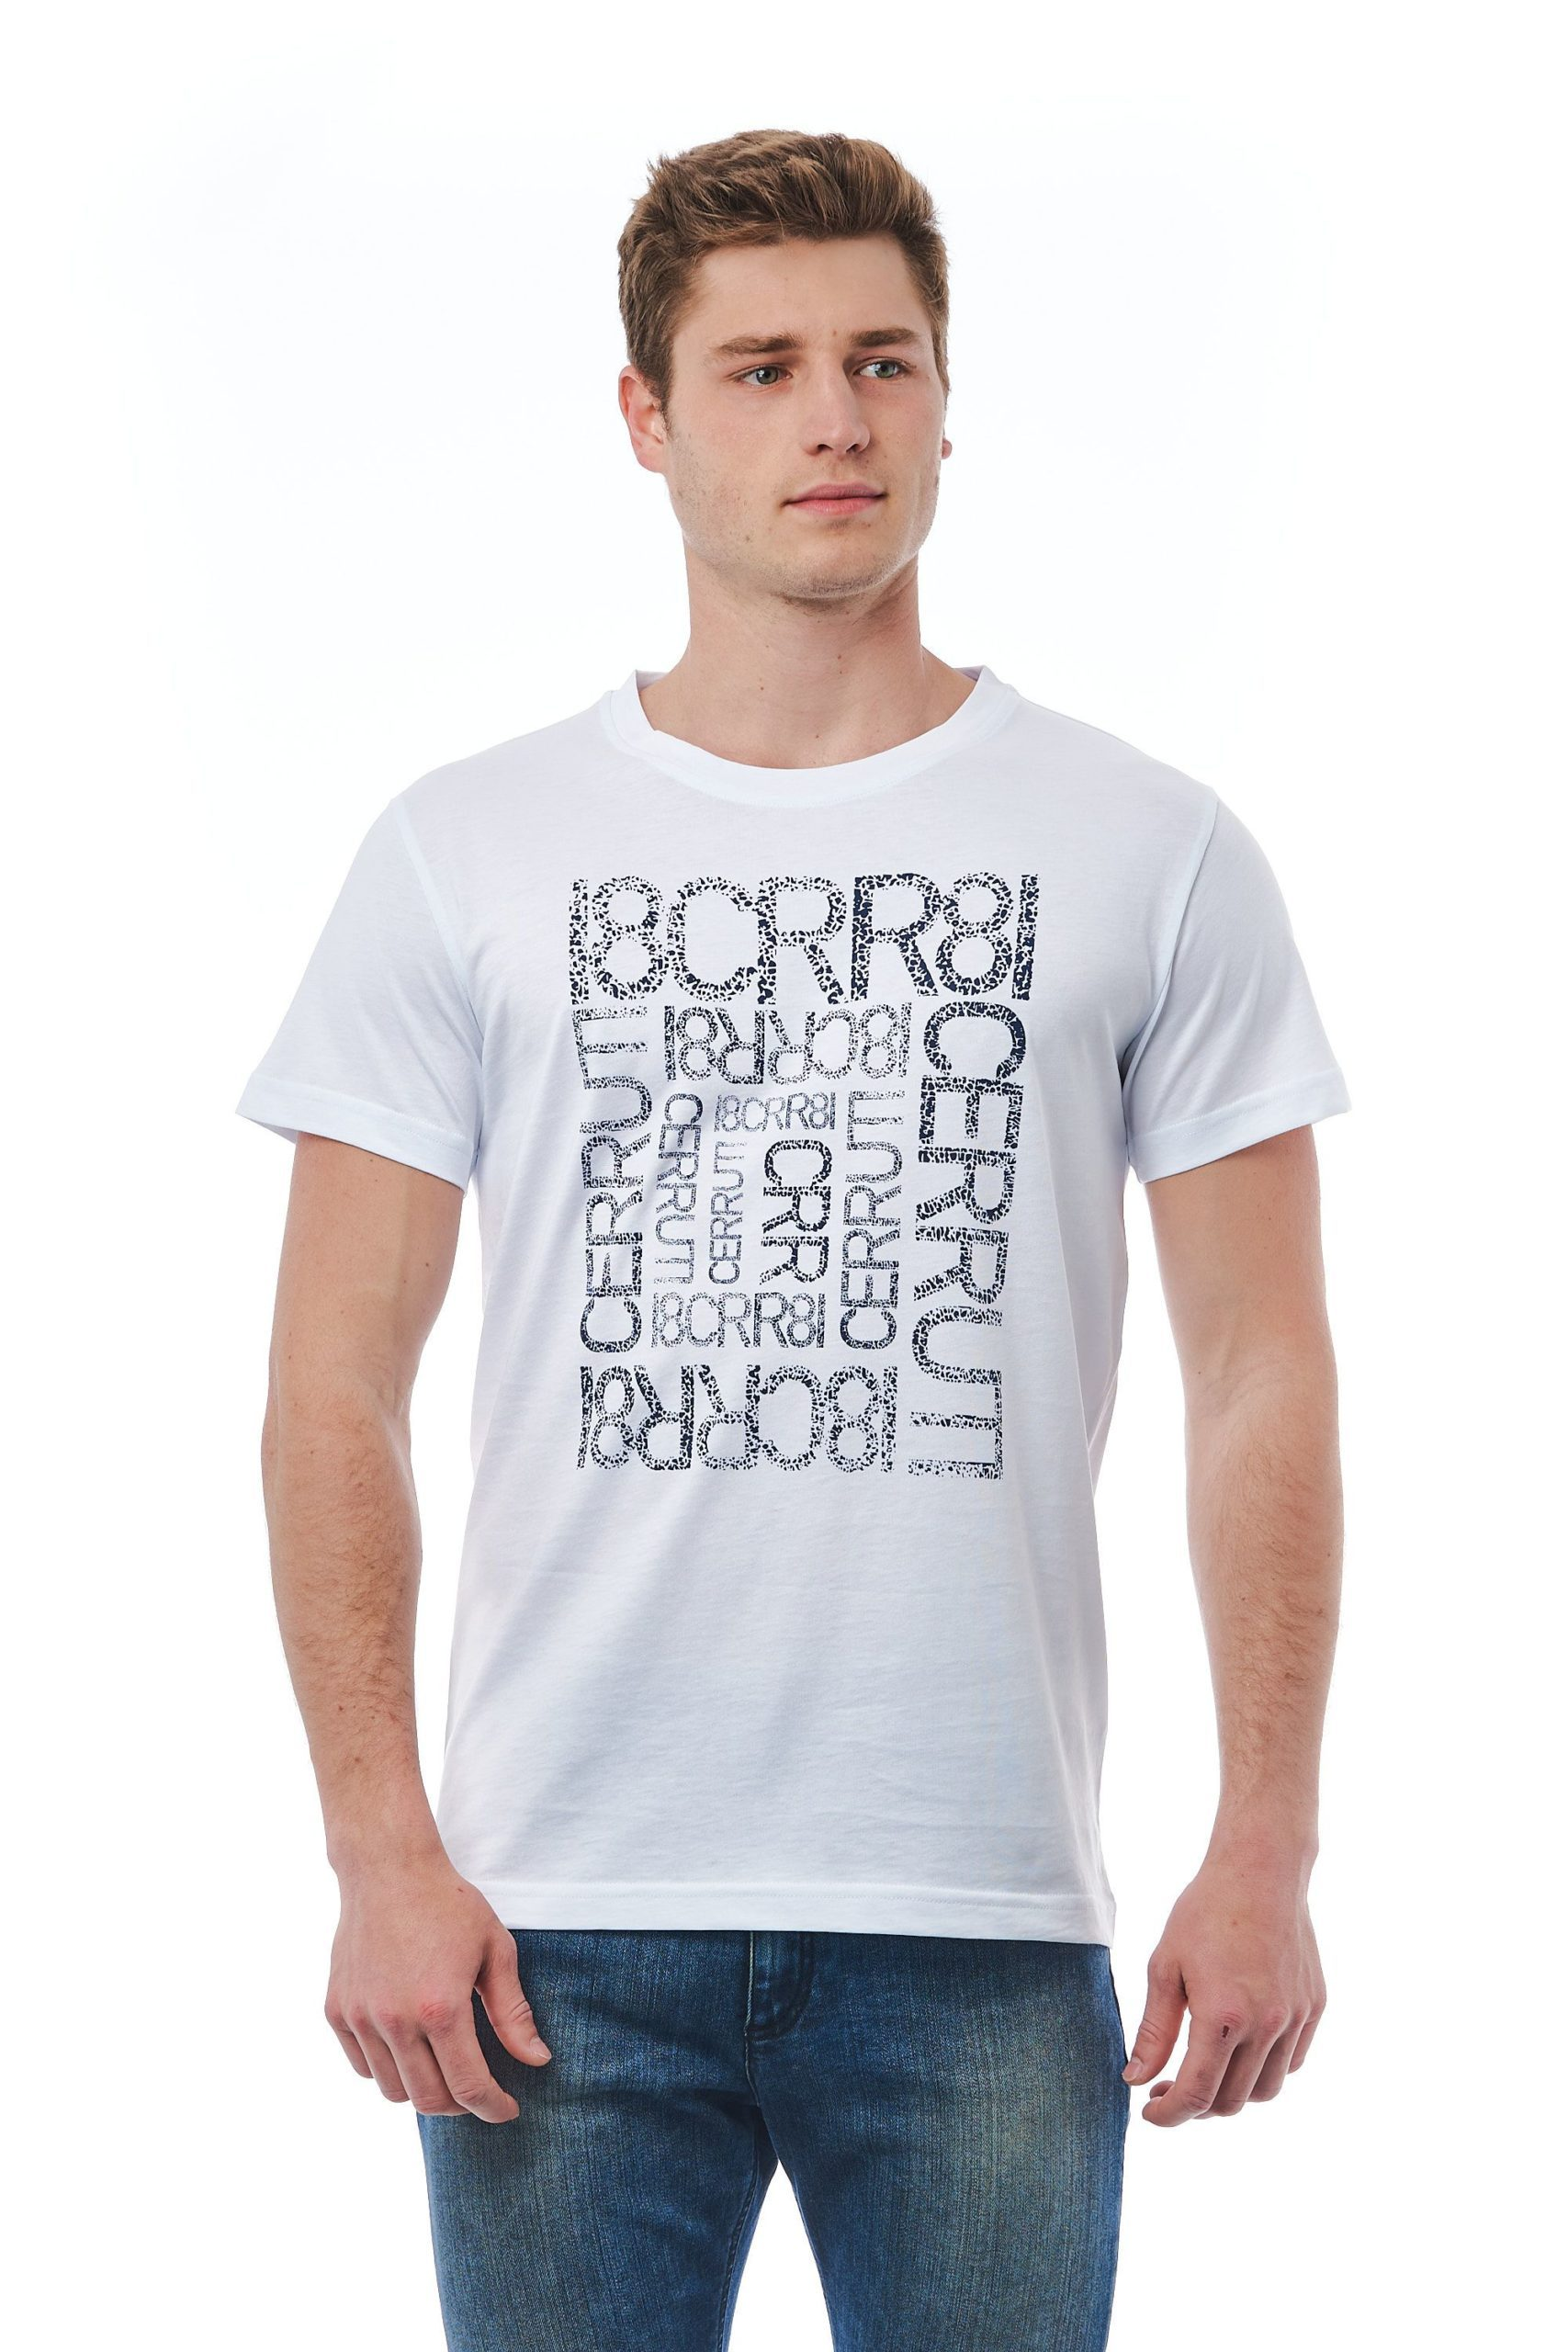 Cerruti 1881 Men's Ghiaccio Ice T-Shirt White CE1409903 - L